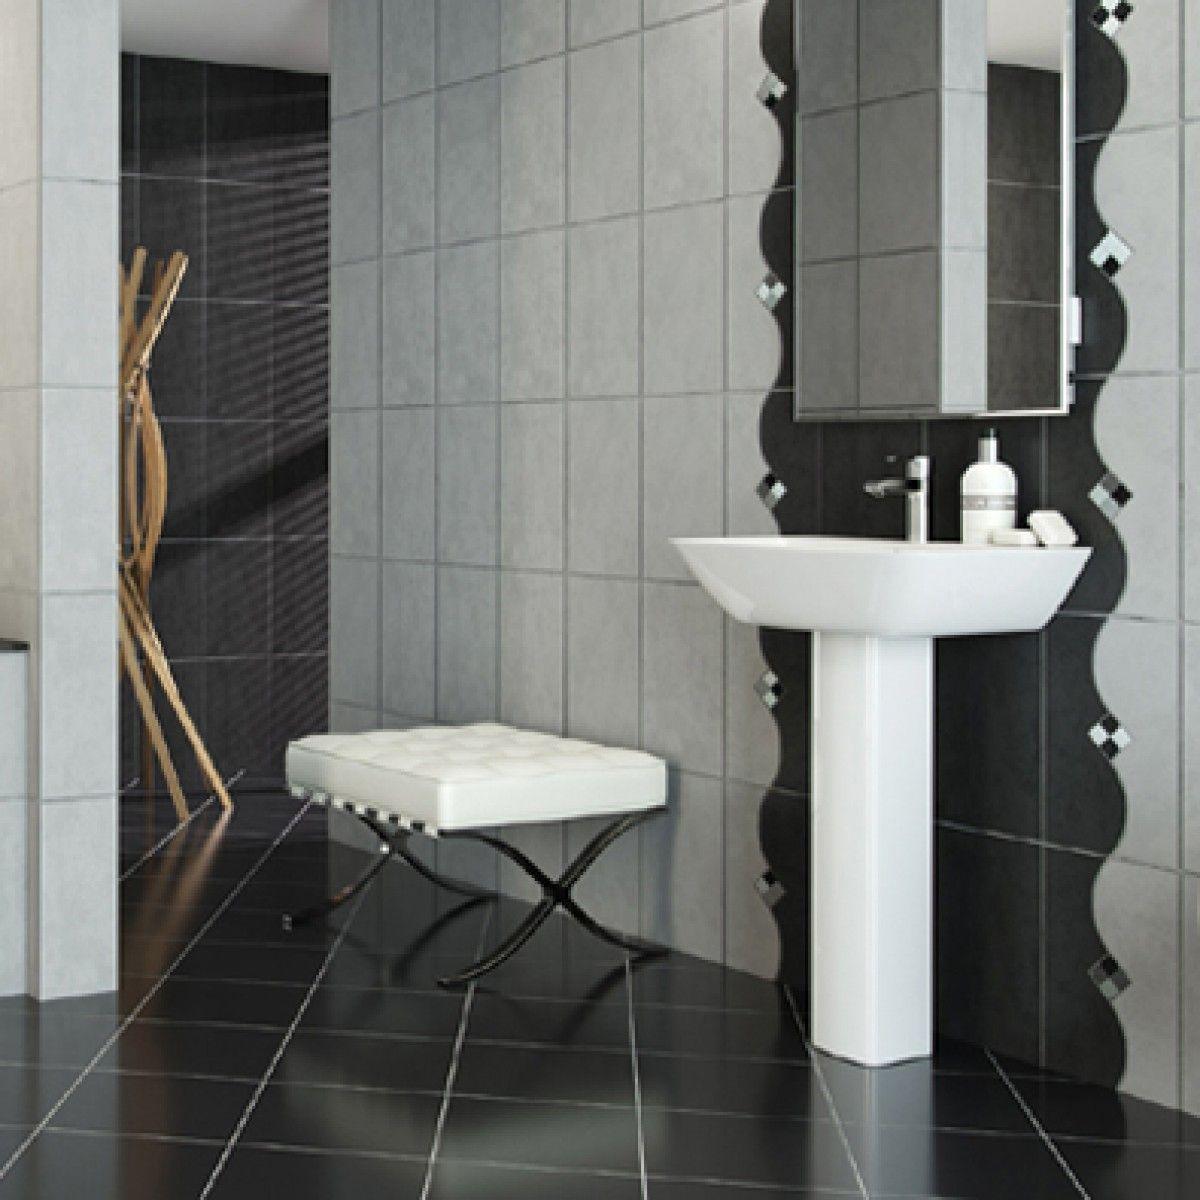 Fiore Light Bathroom Grey Wall Tiles Crown Tiles Grey Wall Tiles Bathroom Wall Tile Light Grey Walls